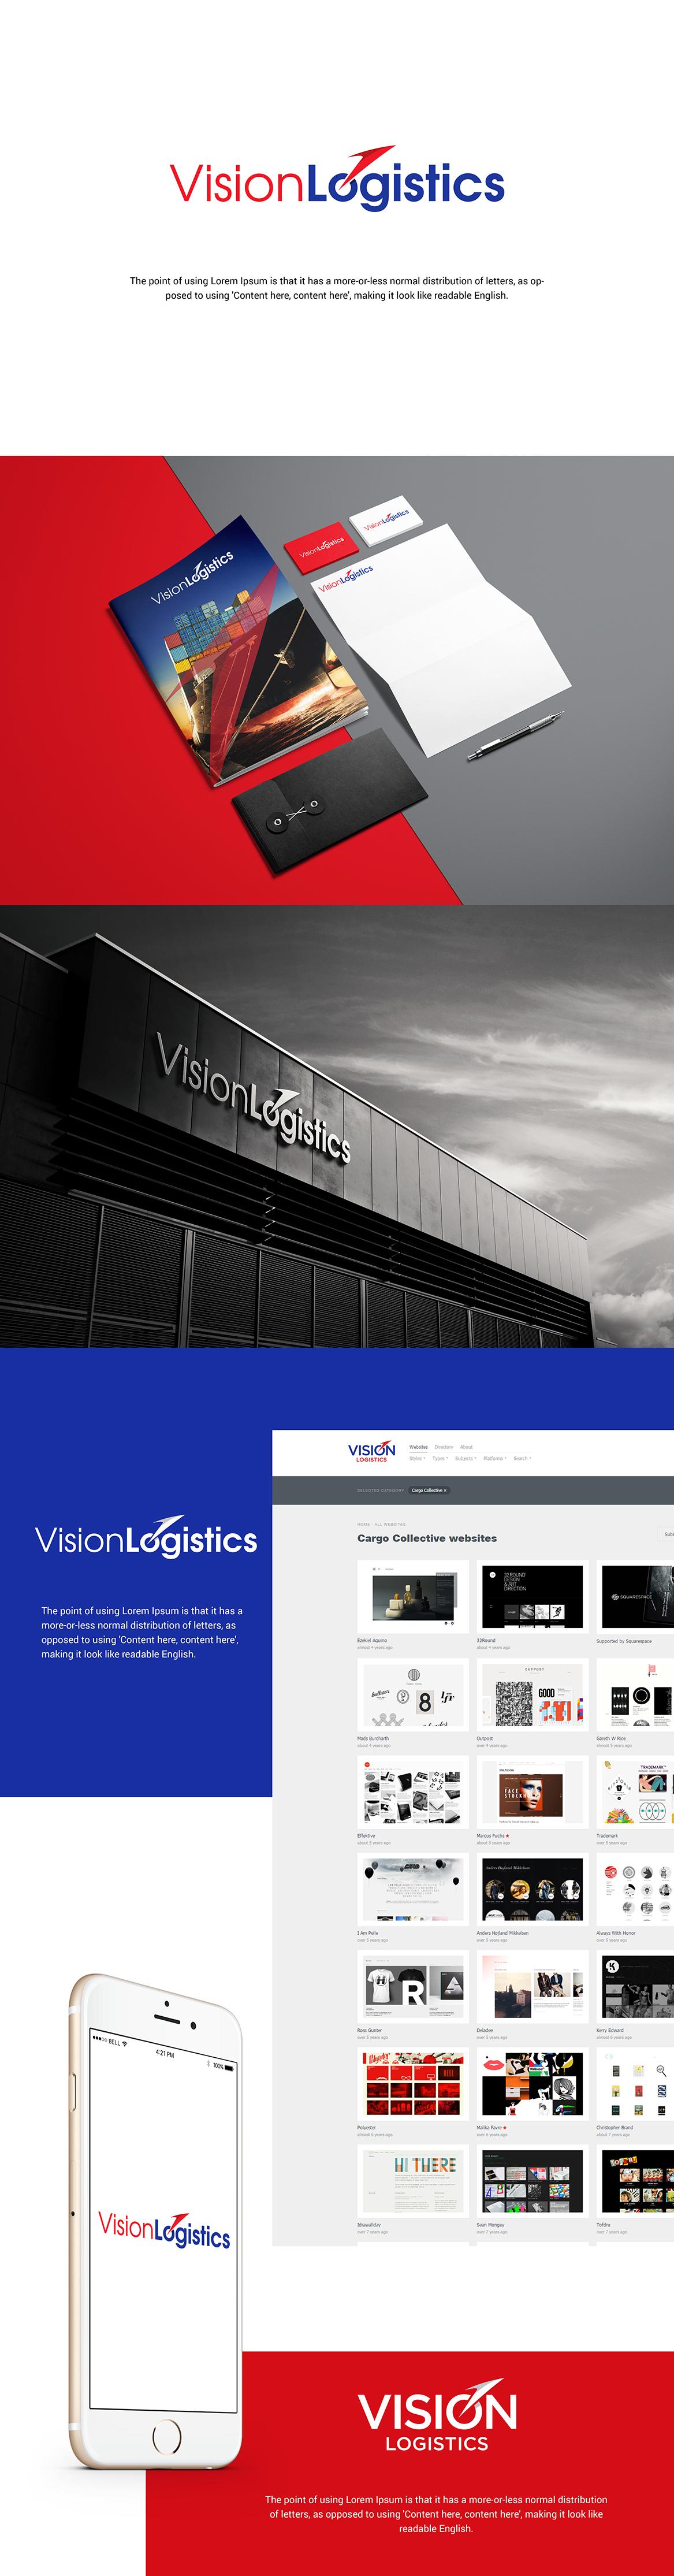 artcore-creative-vision-logistics-logo-identity-design